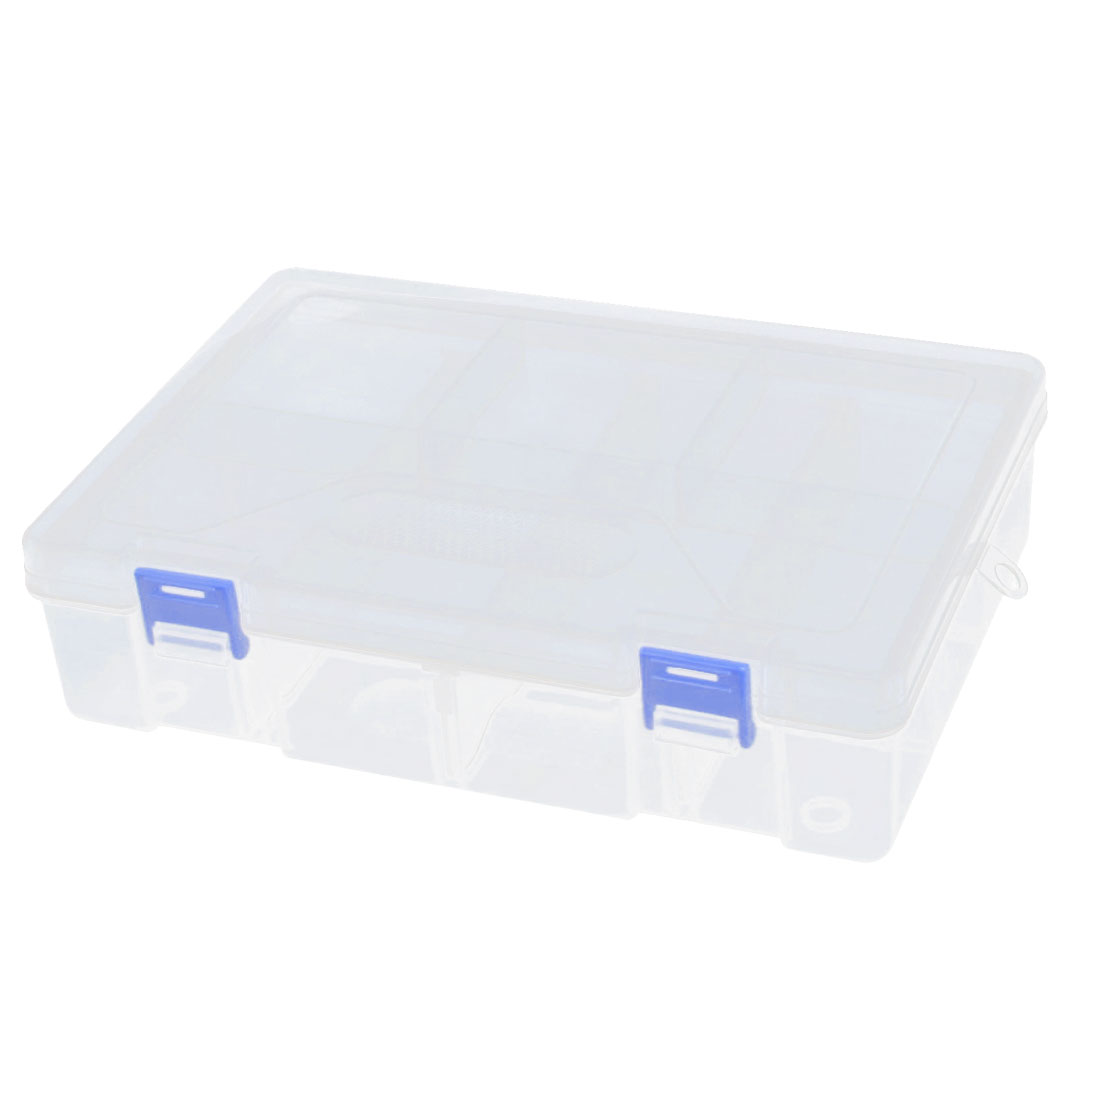 Plastic 8 Compartment 2 Layers Electronic Component Storage Box Case Organizer